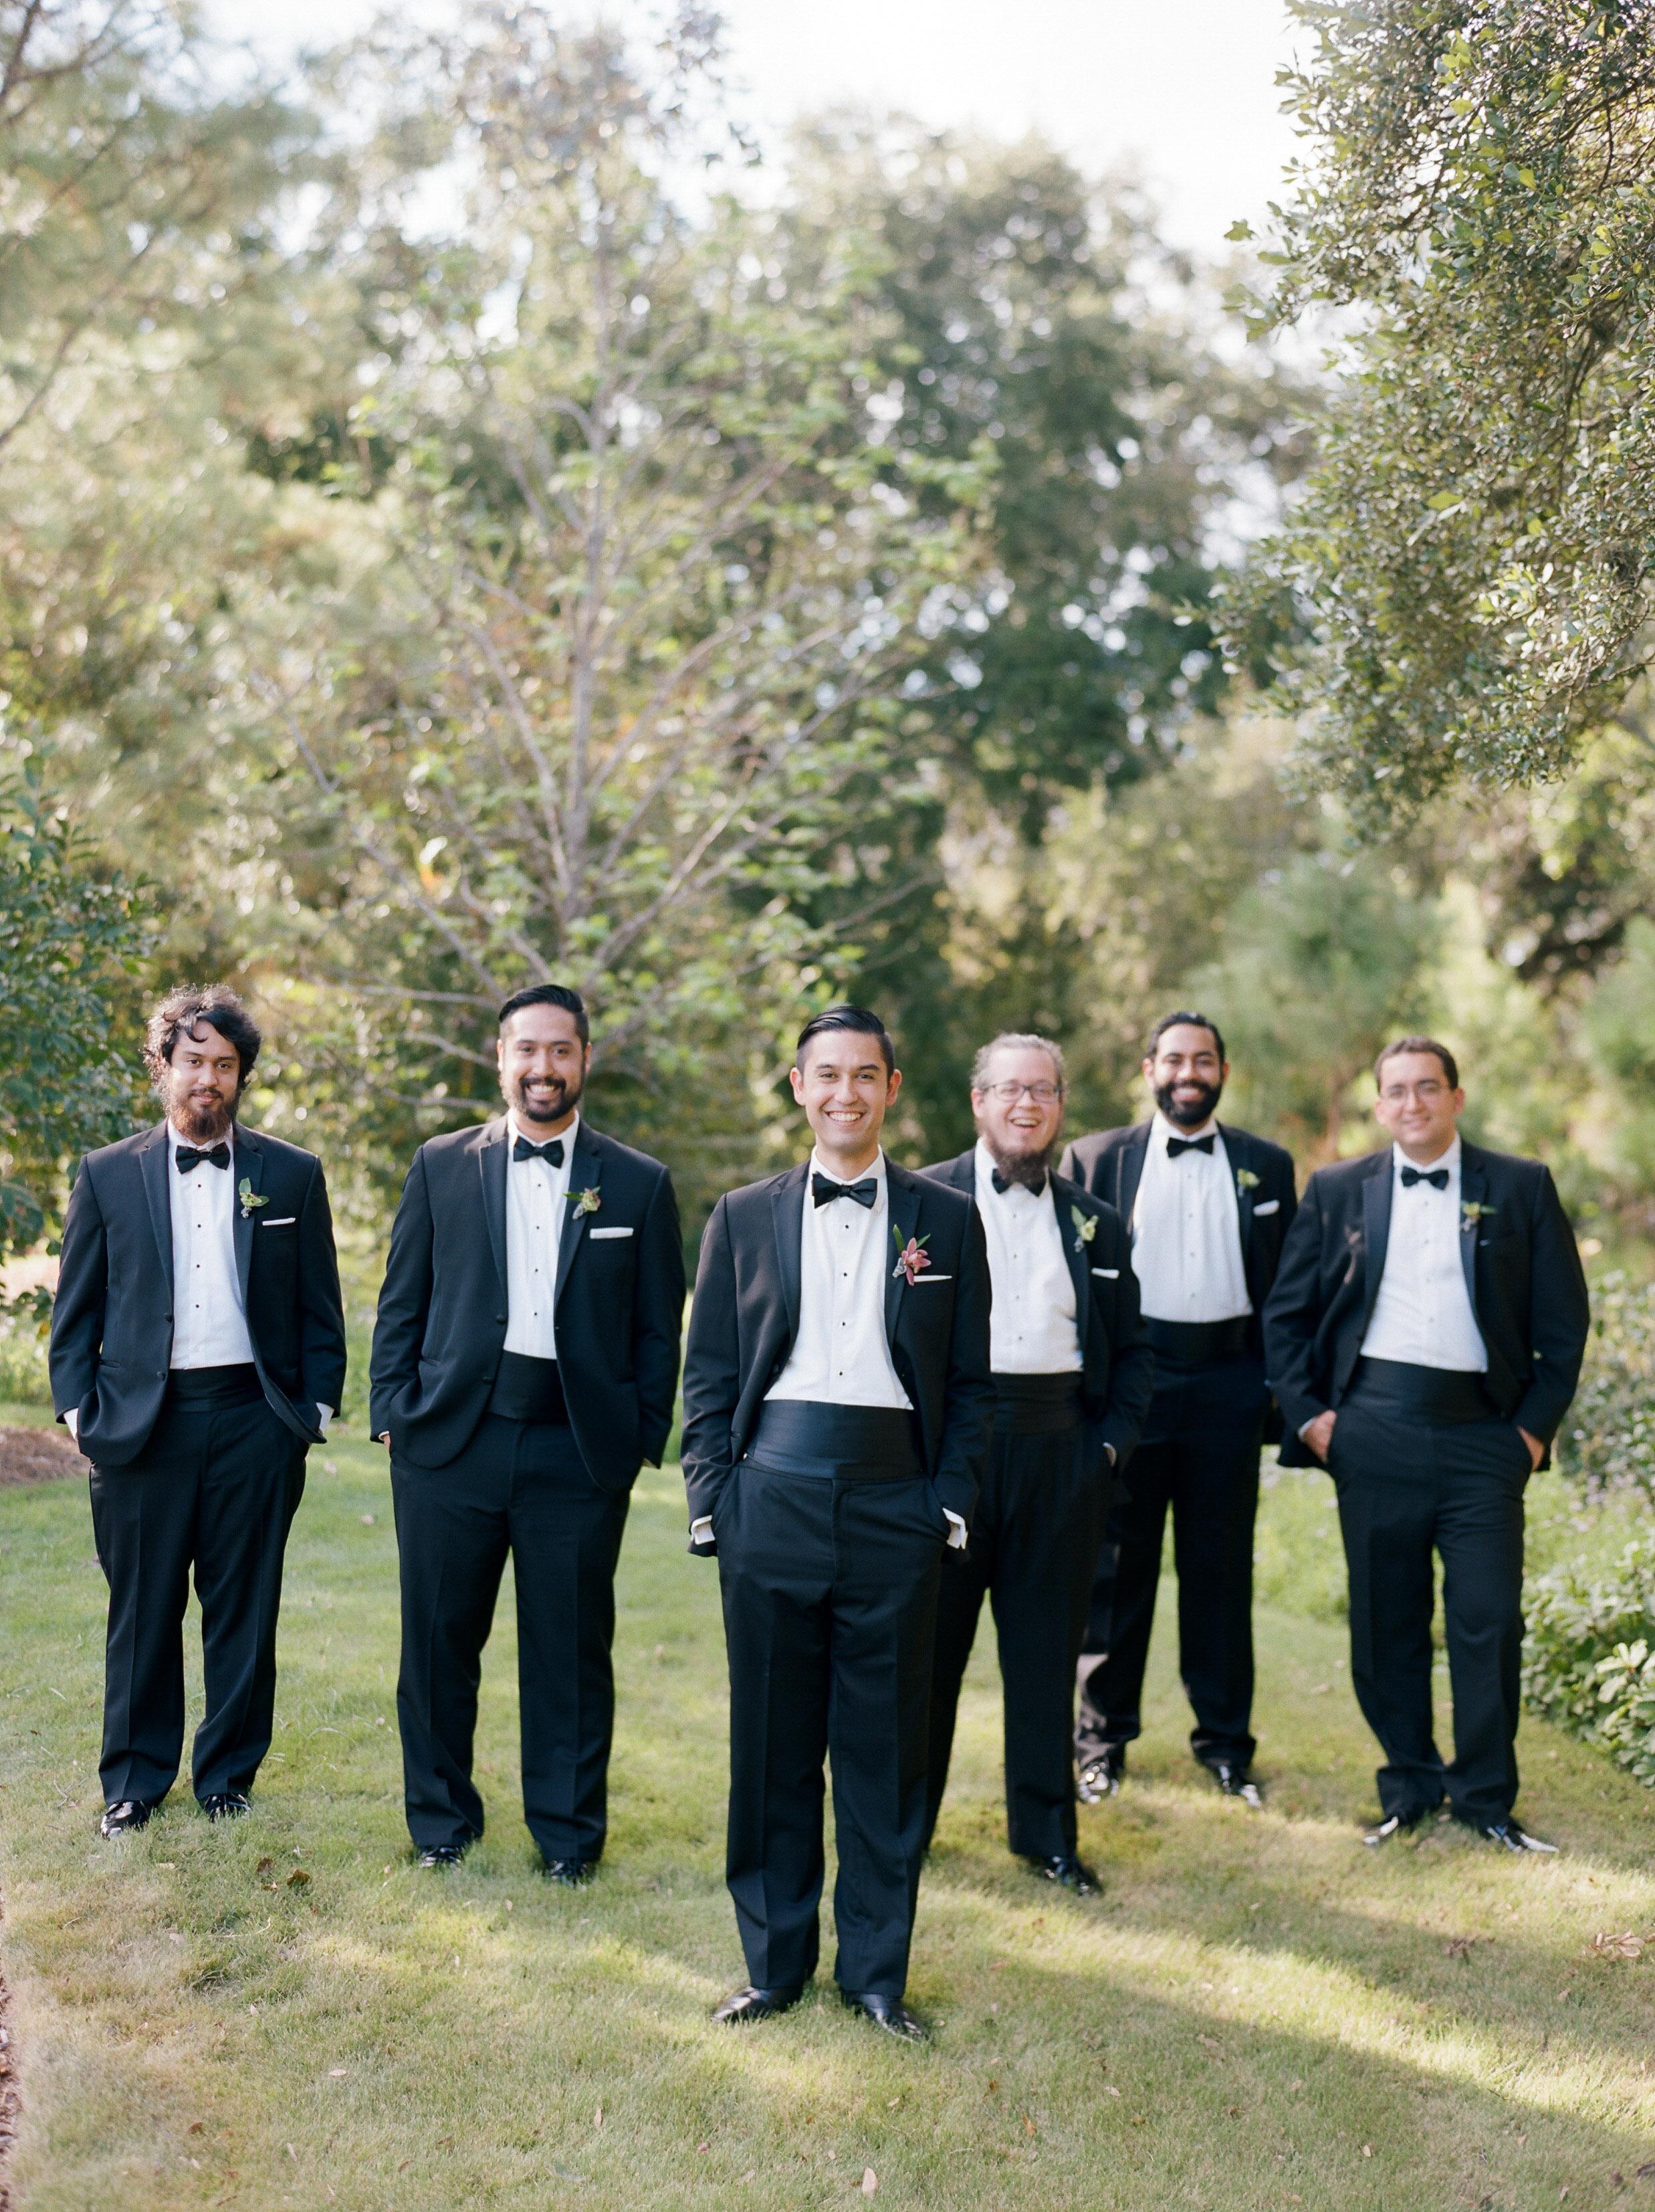 The-Knot-Texas-Magazine-Wedding-Top-Best-Houston-Wedding-Photographer-Fine-Art-Film-Dana-Fernandez-Photography-105.jpg